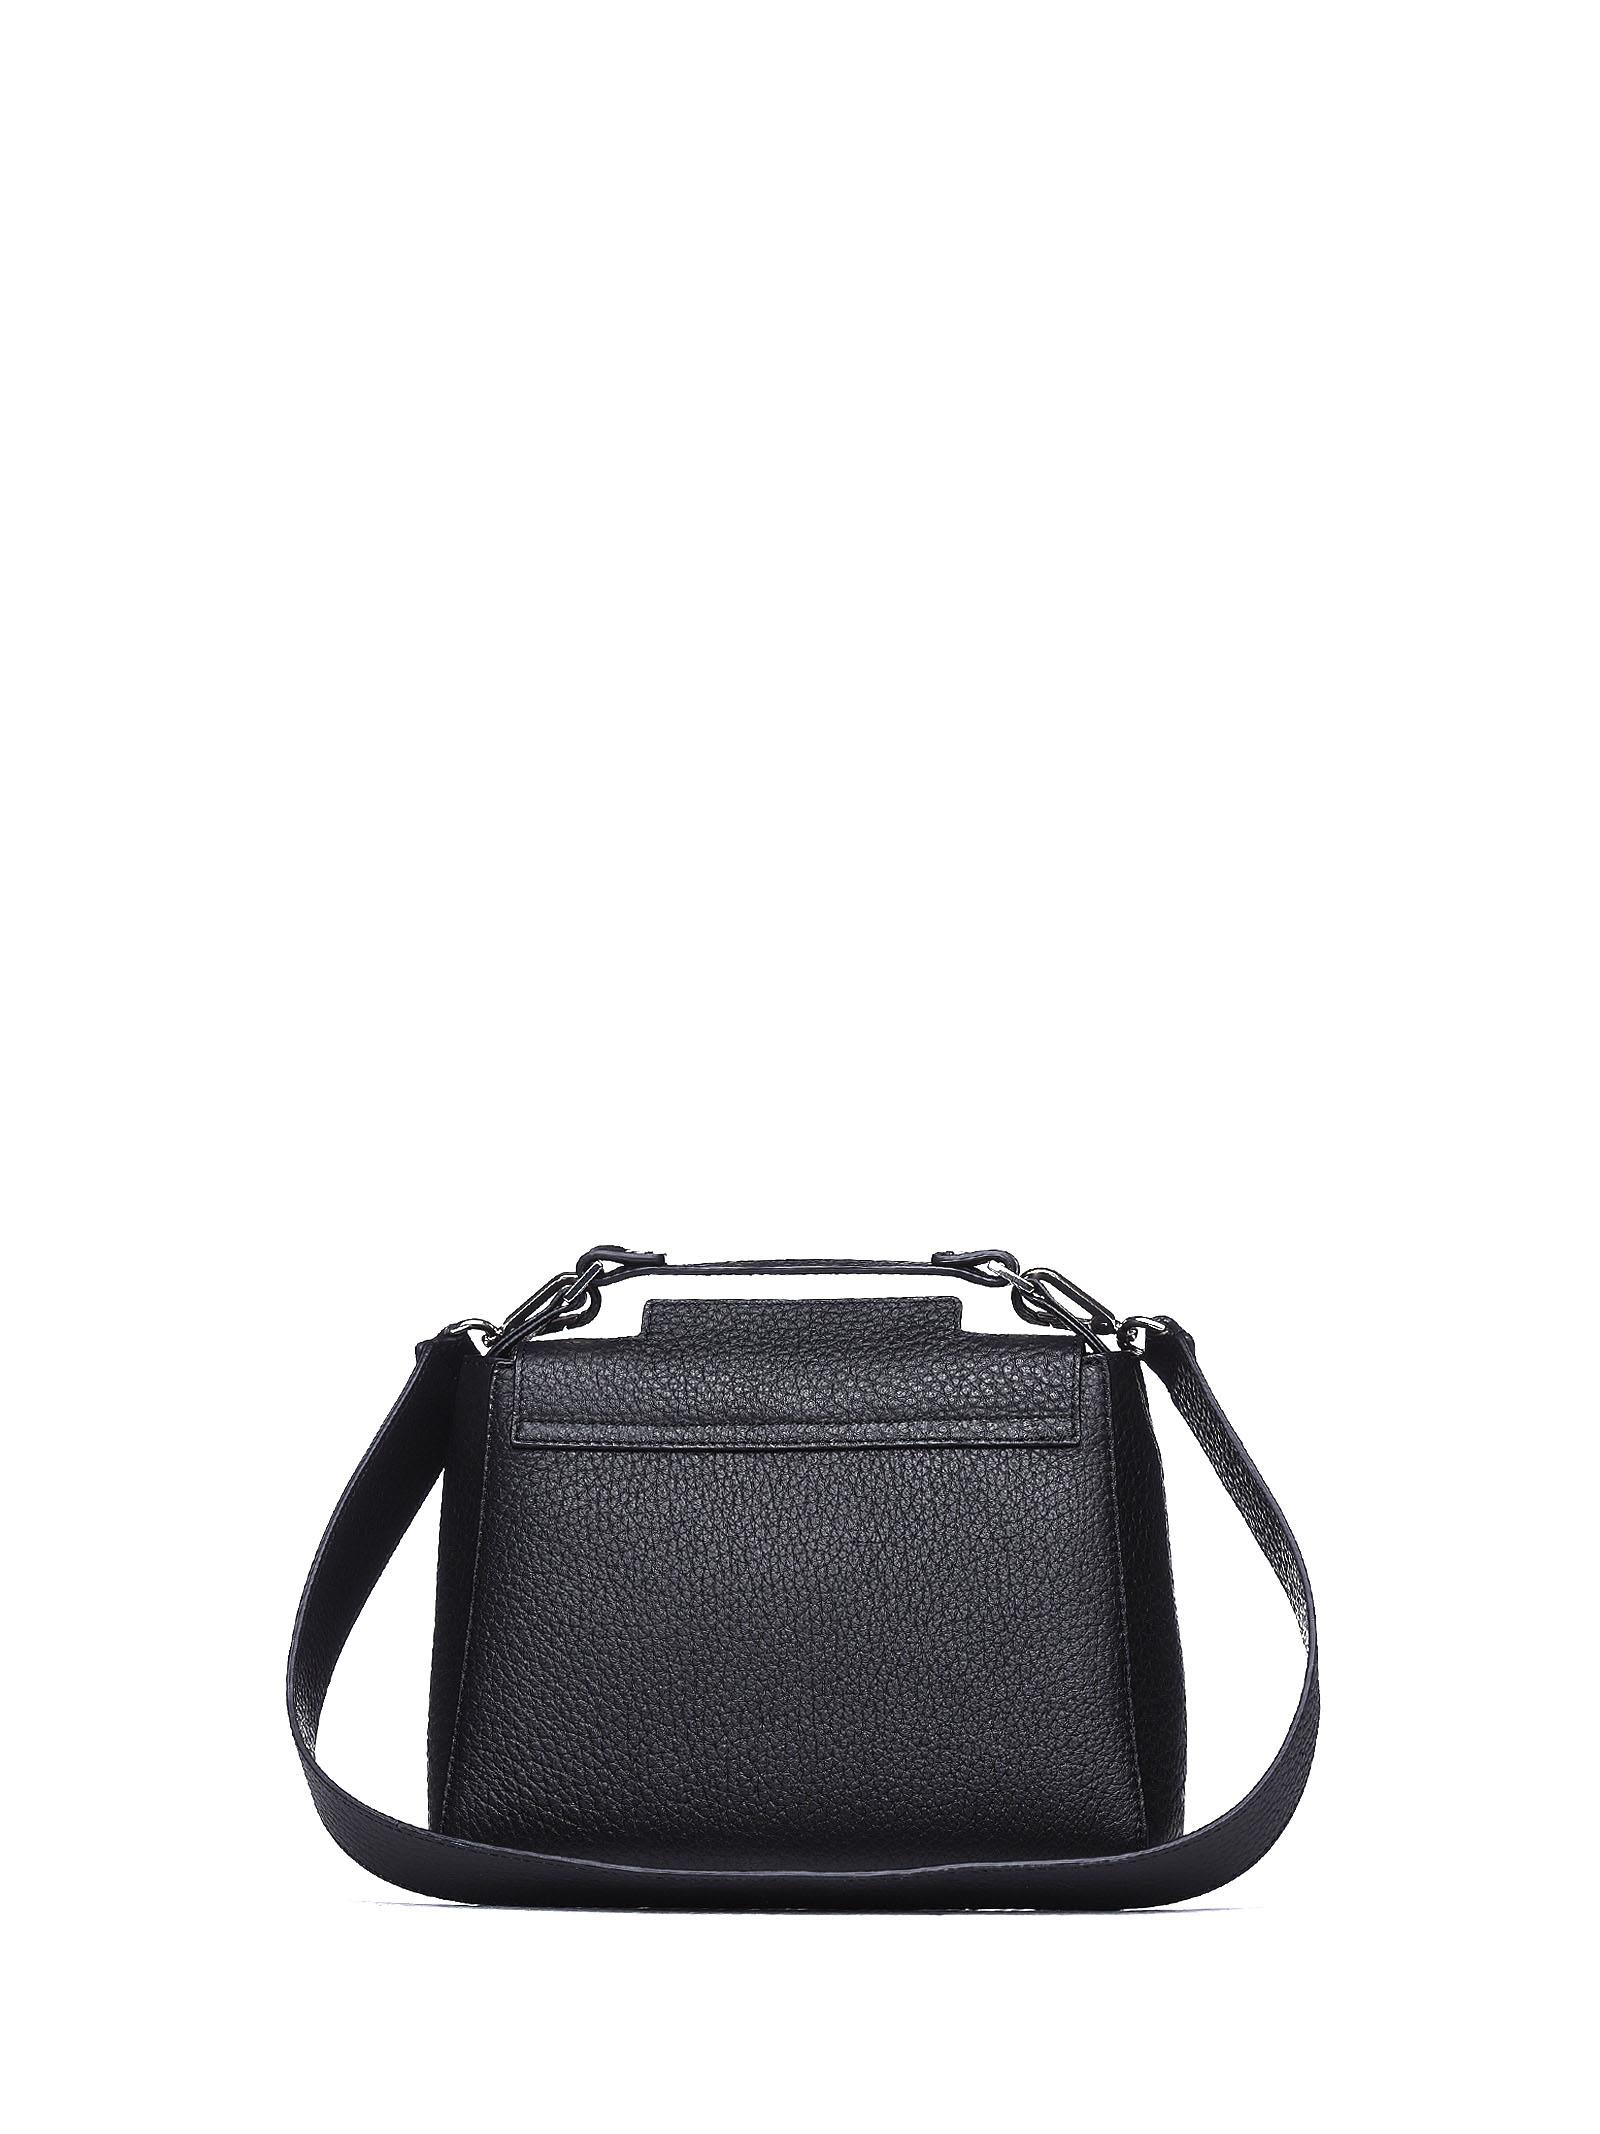 ... Orciani Sveva Small Leather Handbag - NERO a60ec1f4b7184